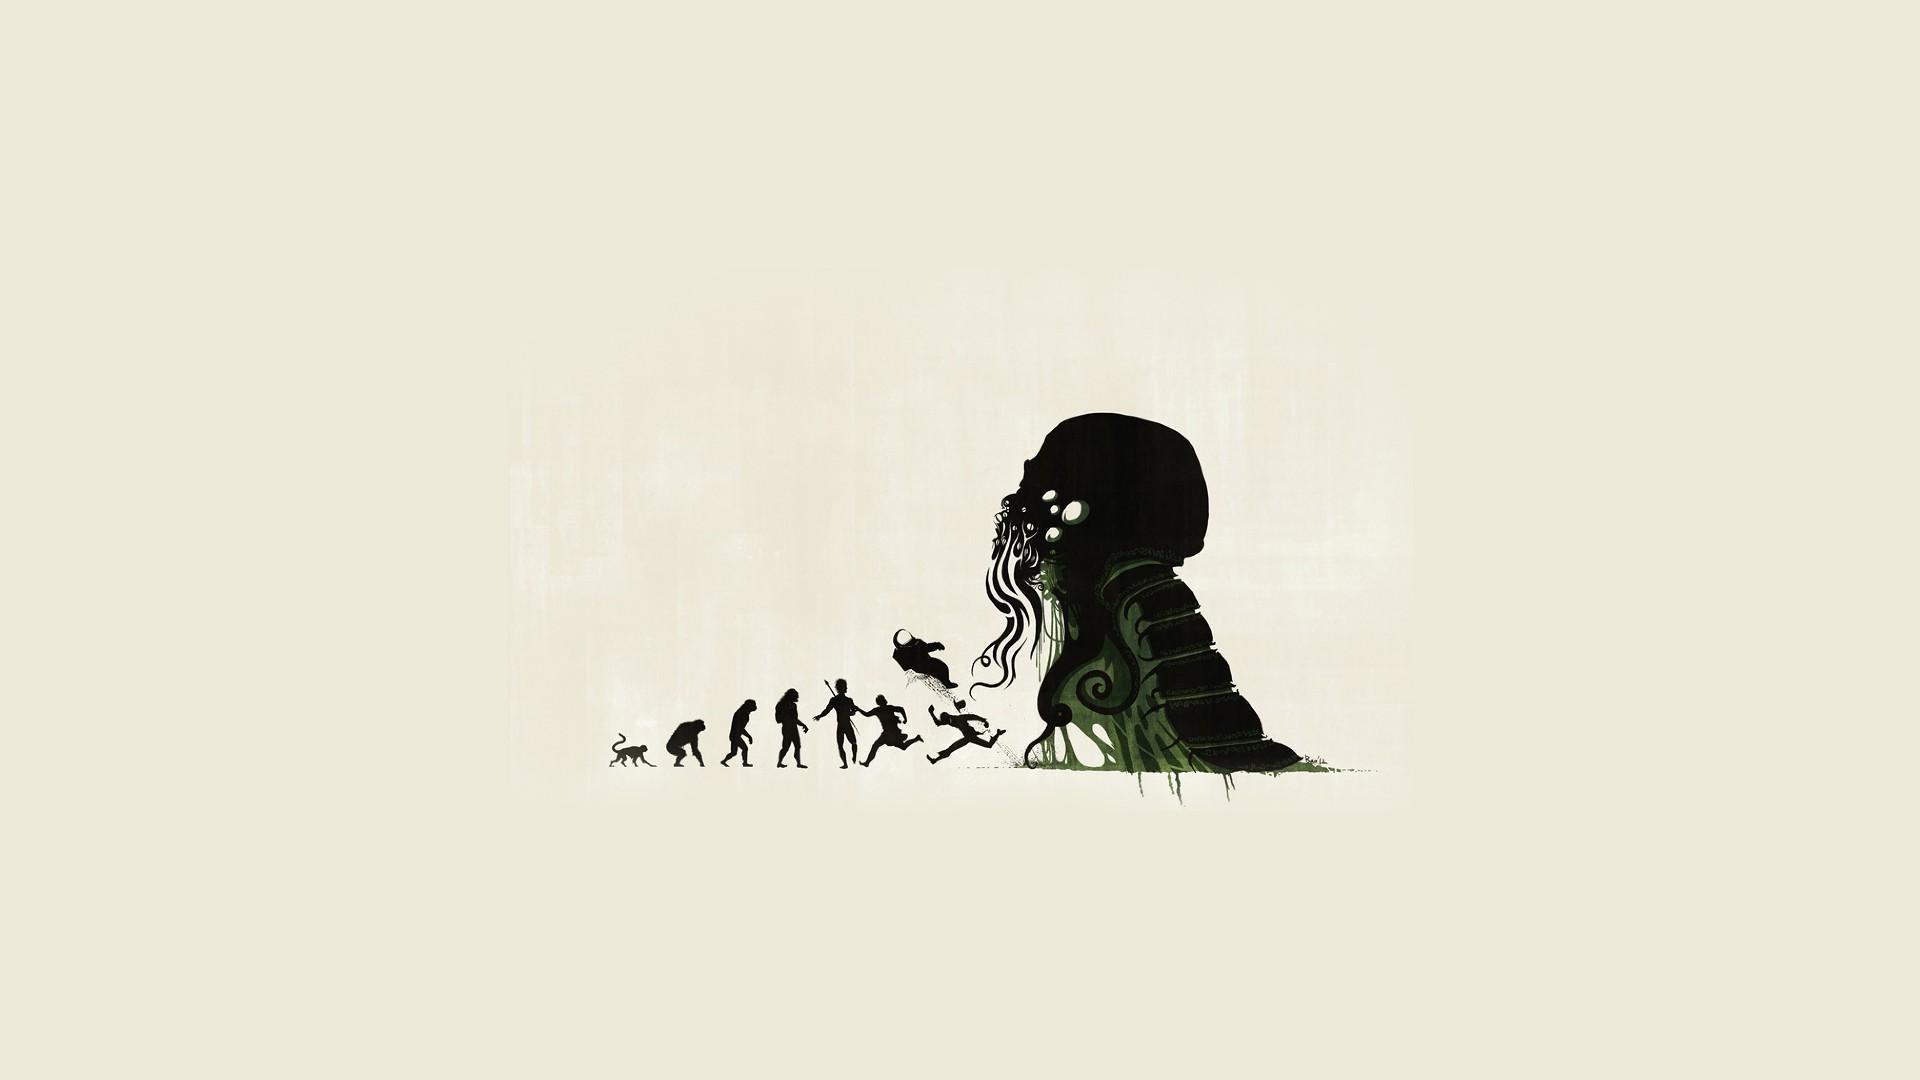 General evolution Cthulhu artwork minimalism horror H. P.  Lovecraft white background simple background